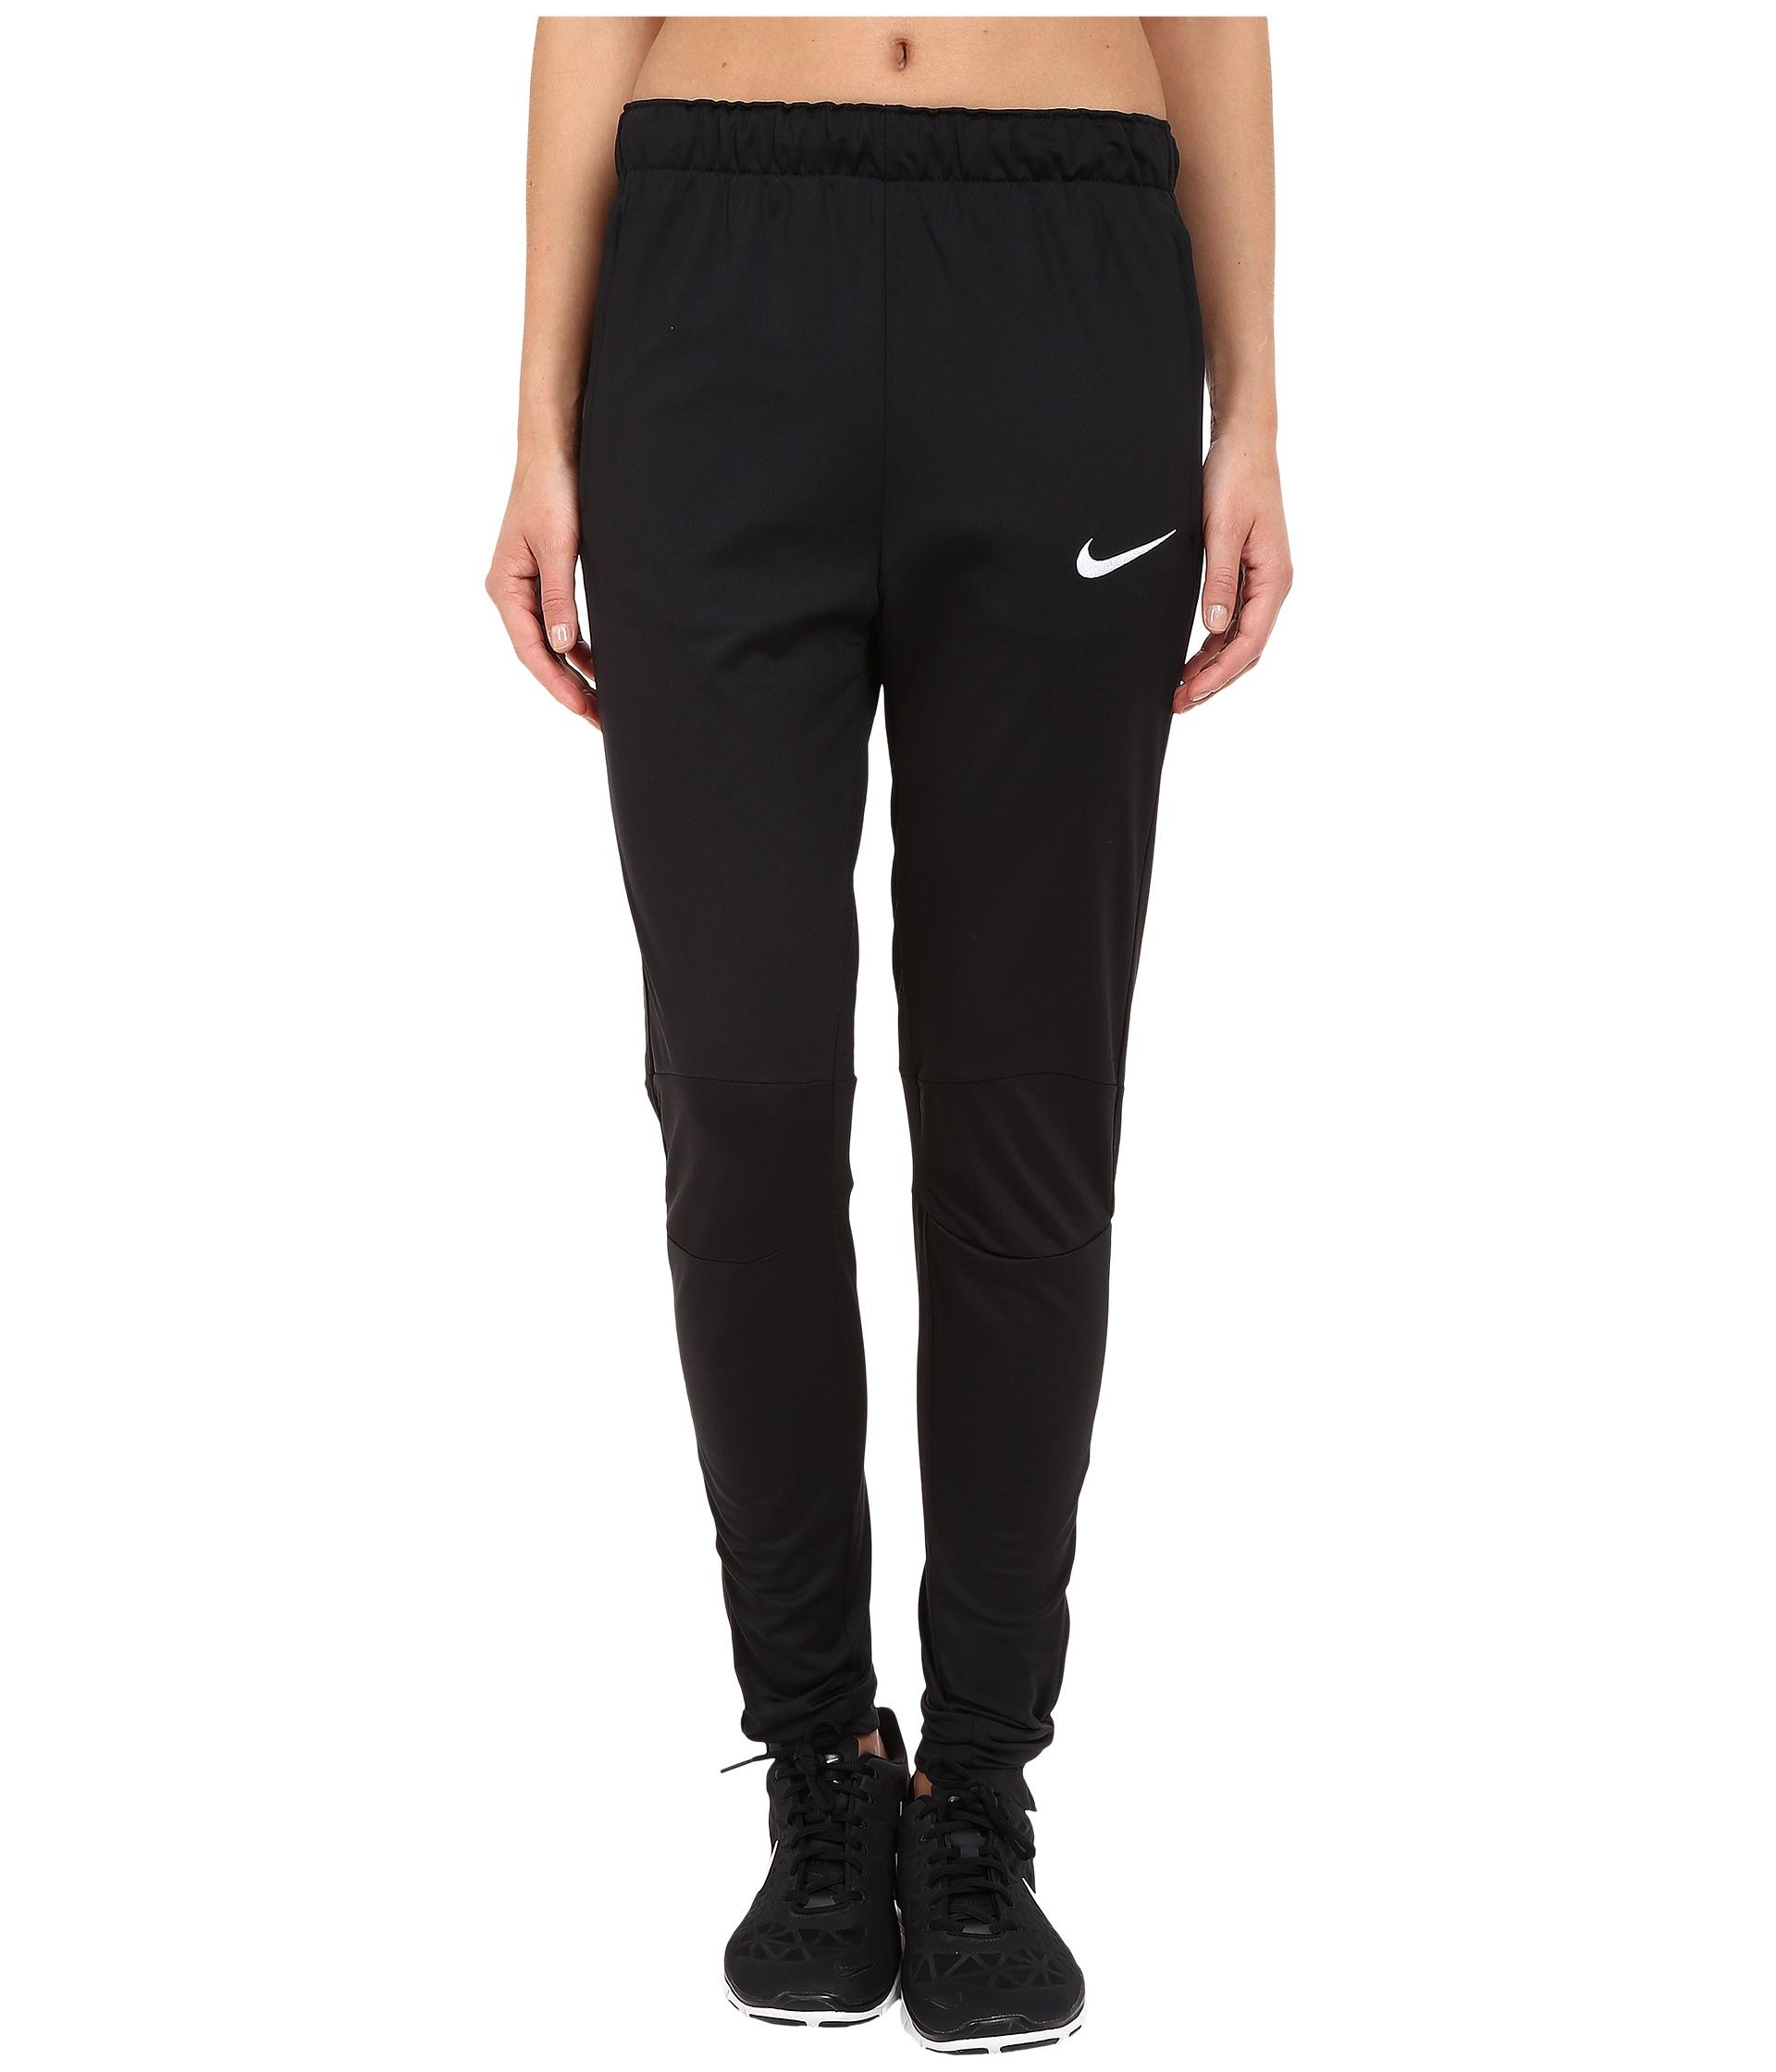 Brilliant Soccer Nike Women39s Soccer Knit Pant  SOCCERCOM